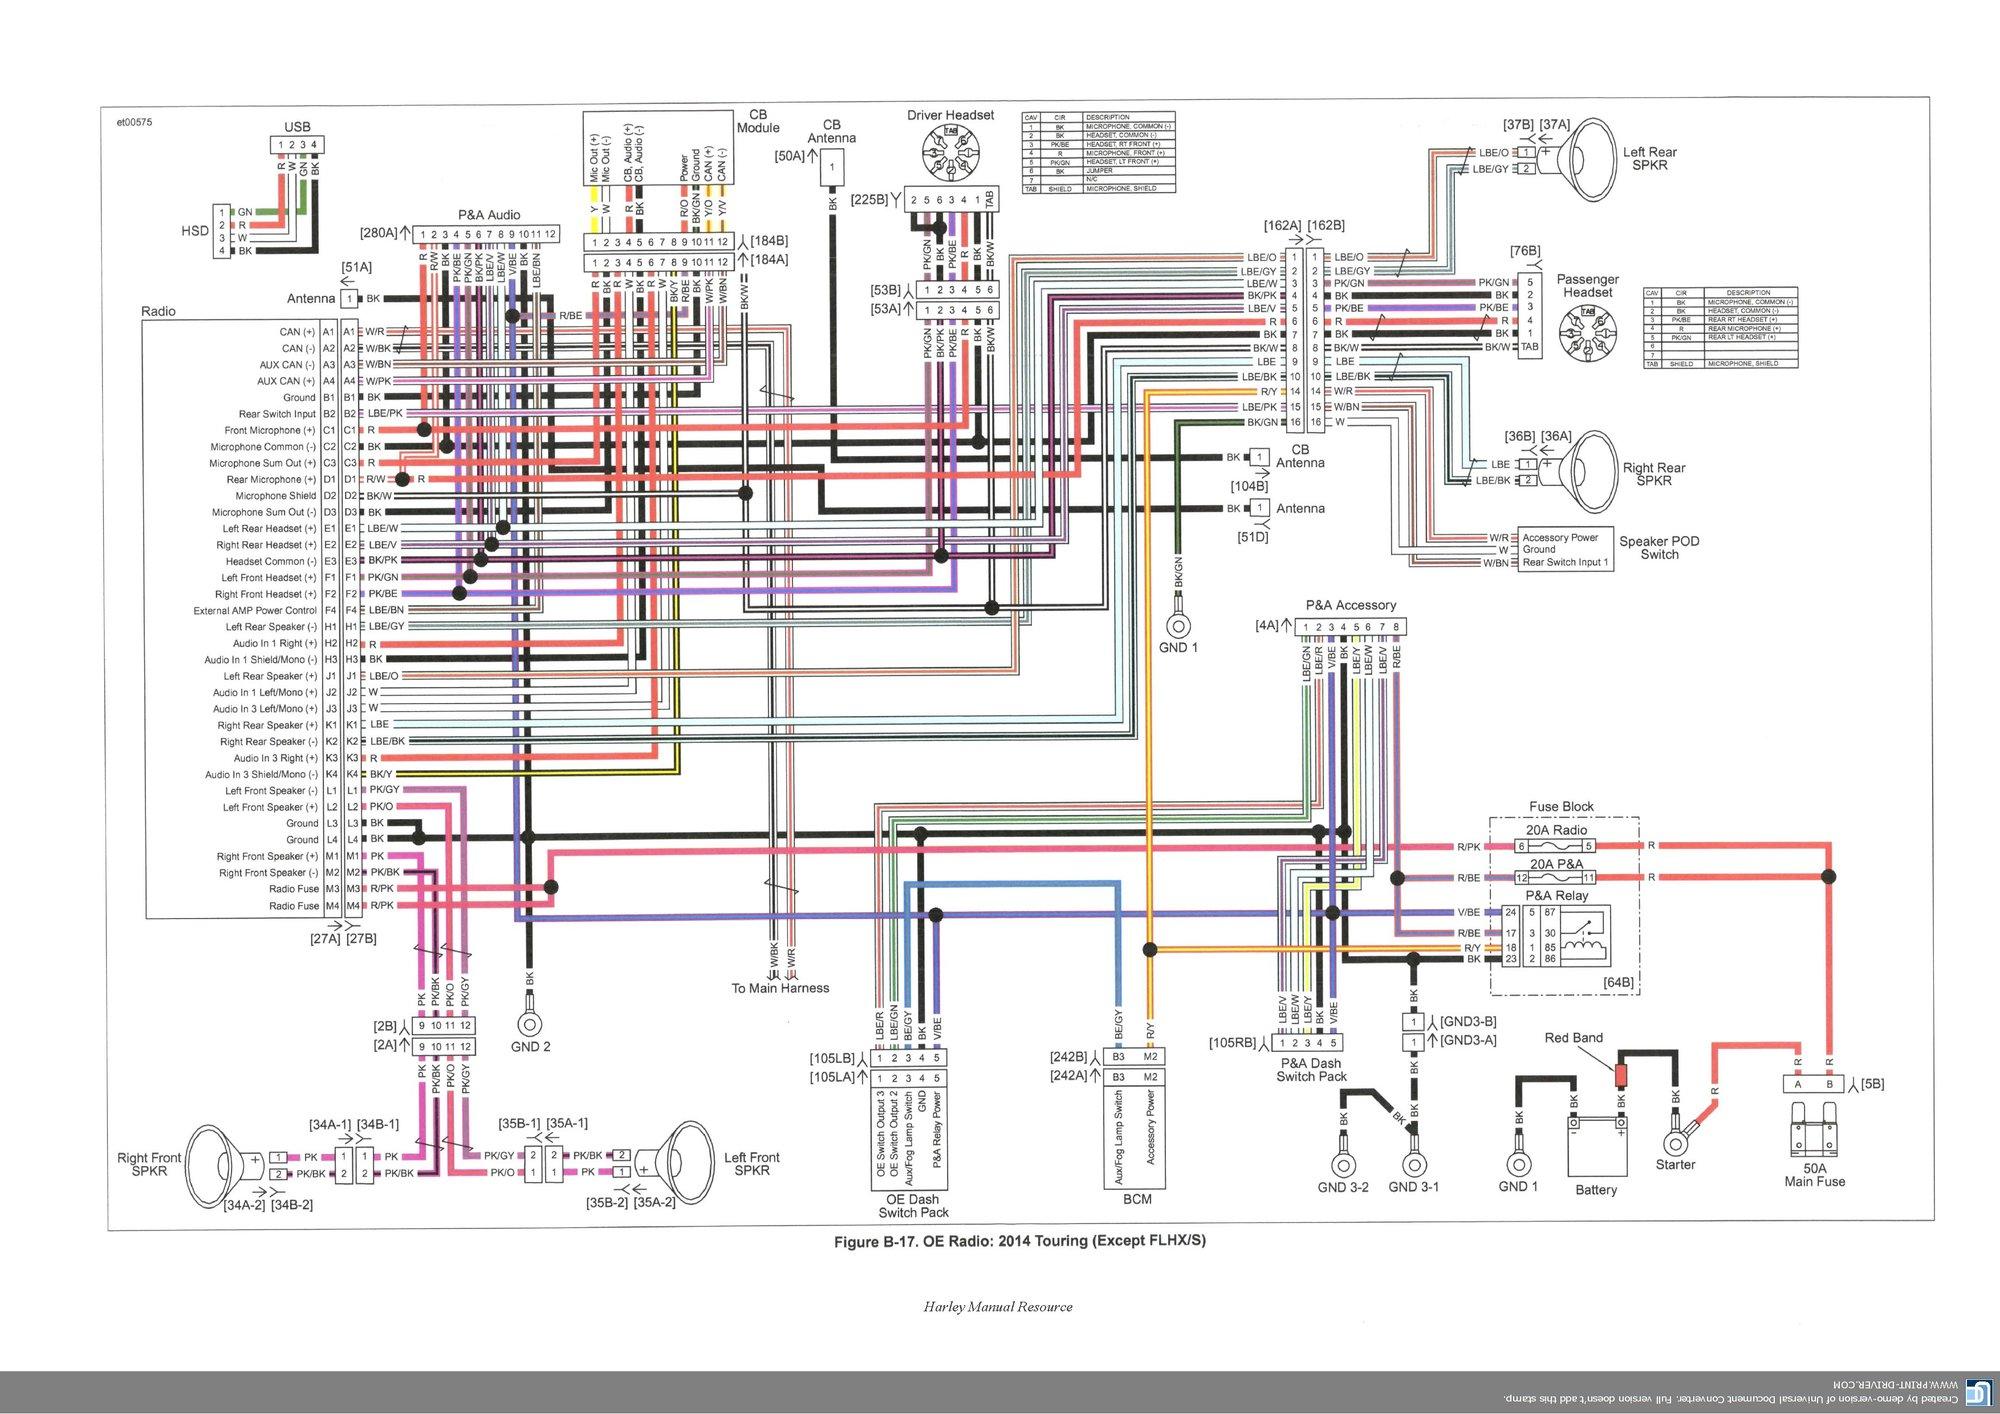 headlight wiring diagram 2016 street glide fk 1586  2011 wiring diagram help harley davidson forums free diagram  harley davidson forums free diagram